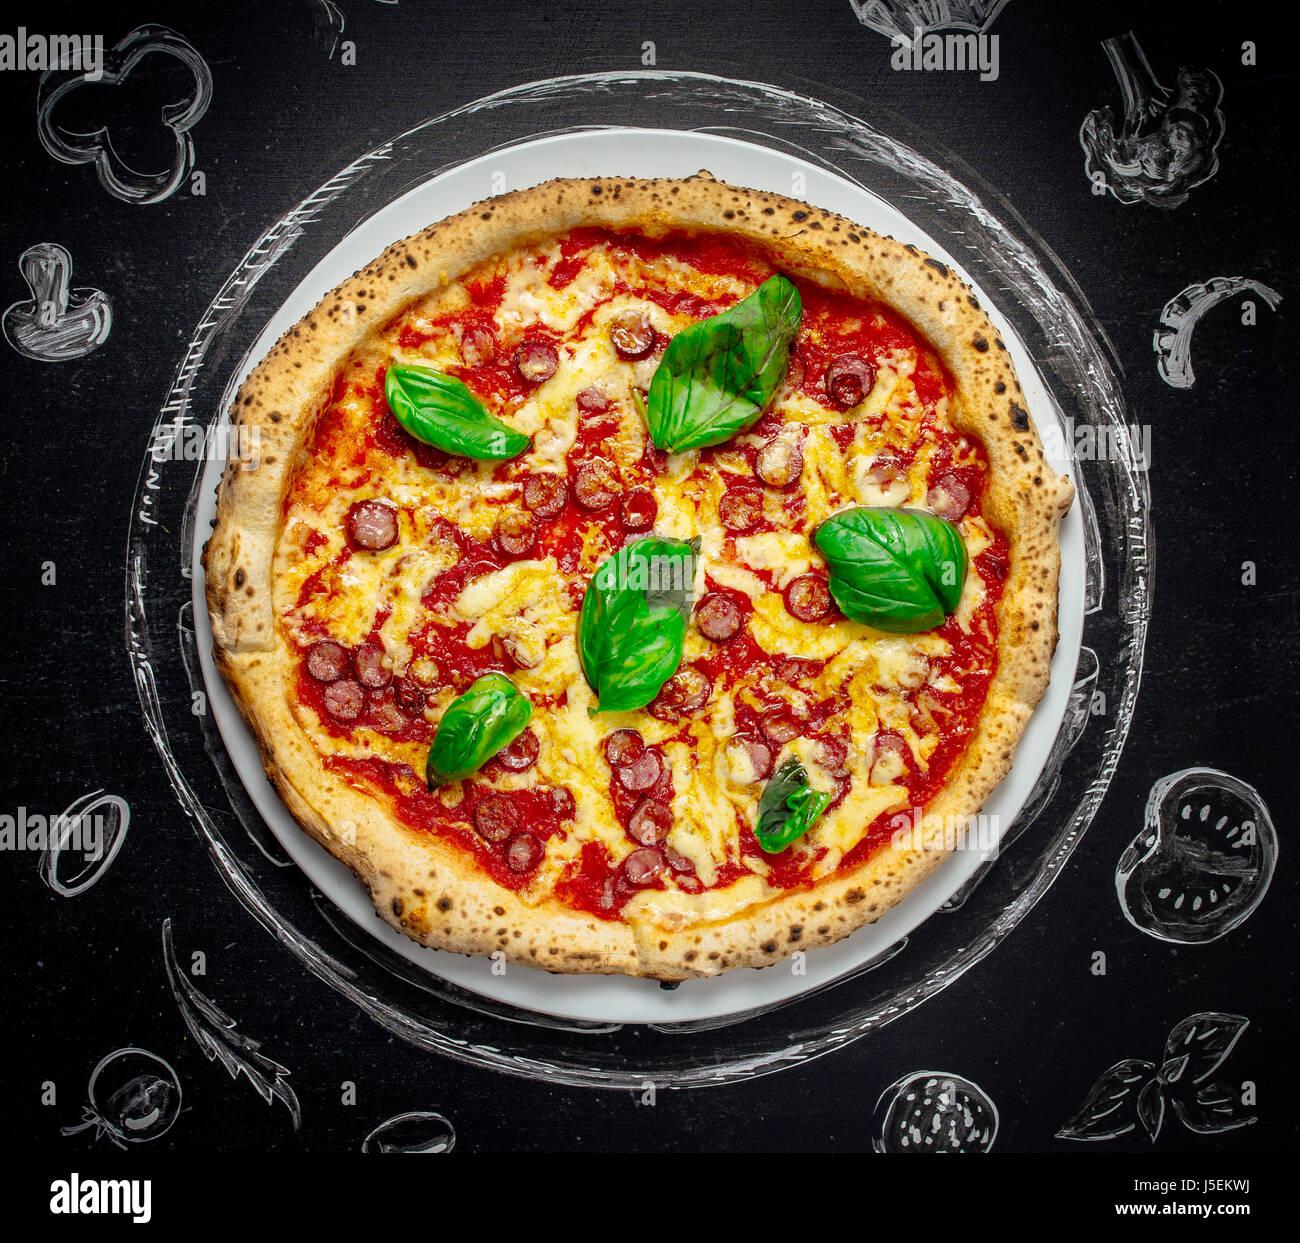 tasty Italian pizza with basil - Stock Image